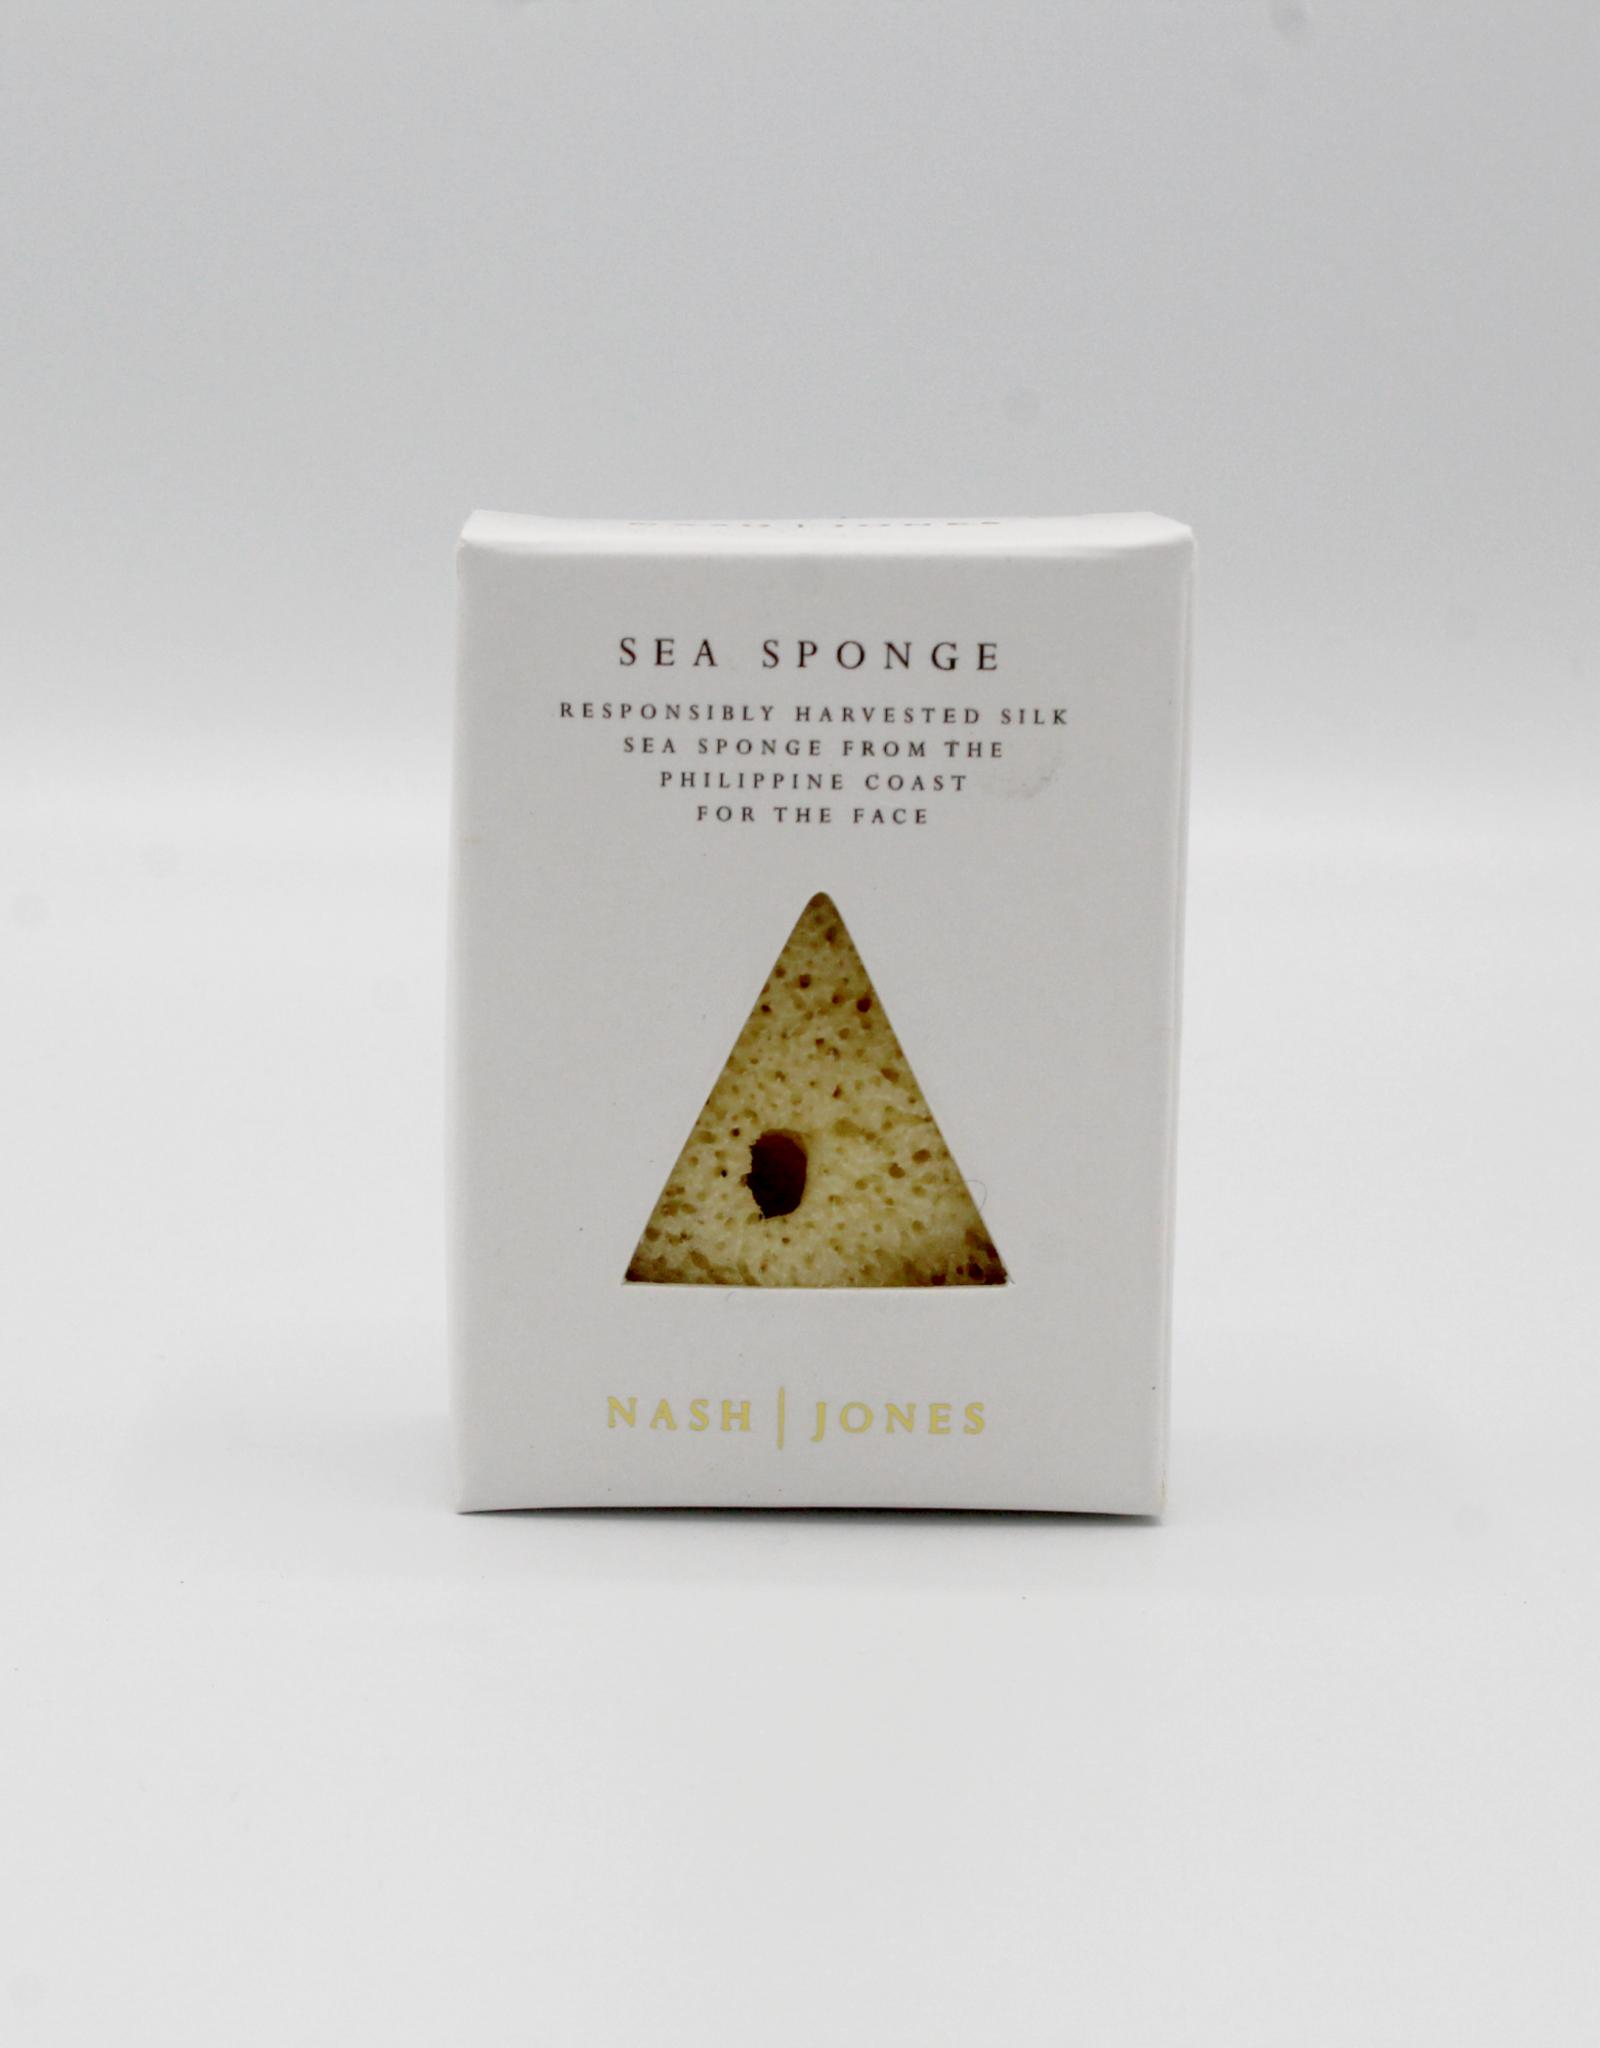 Nash and Jones Facial Sea Sponge